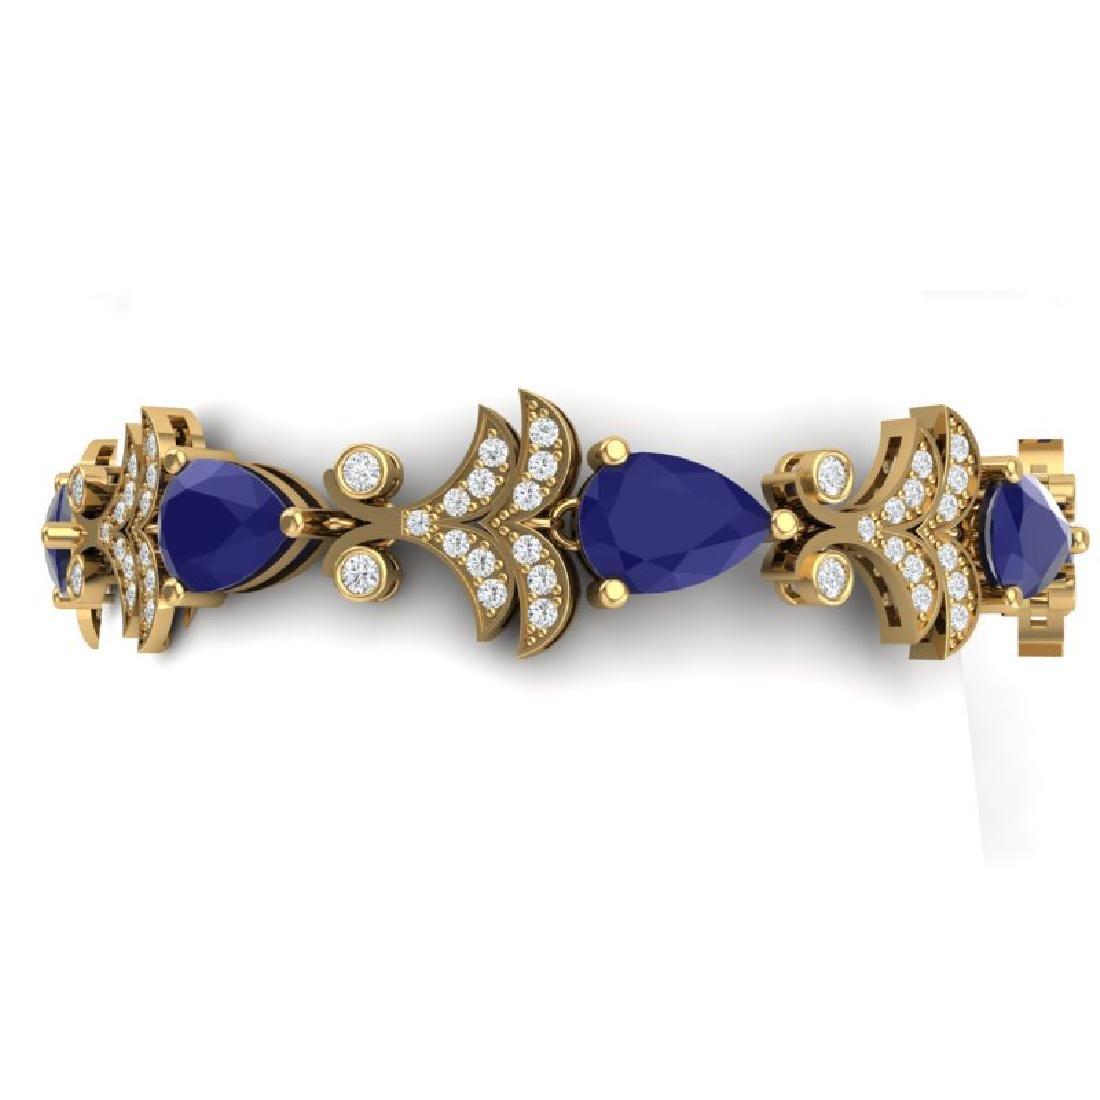 24.8 CTW Royalty Sapphire & VS Diamond Bracelet 18K